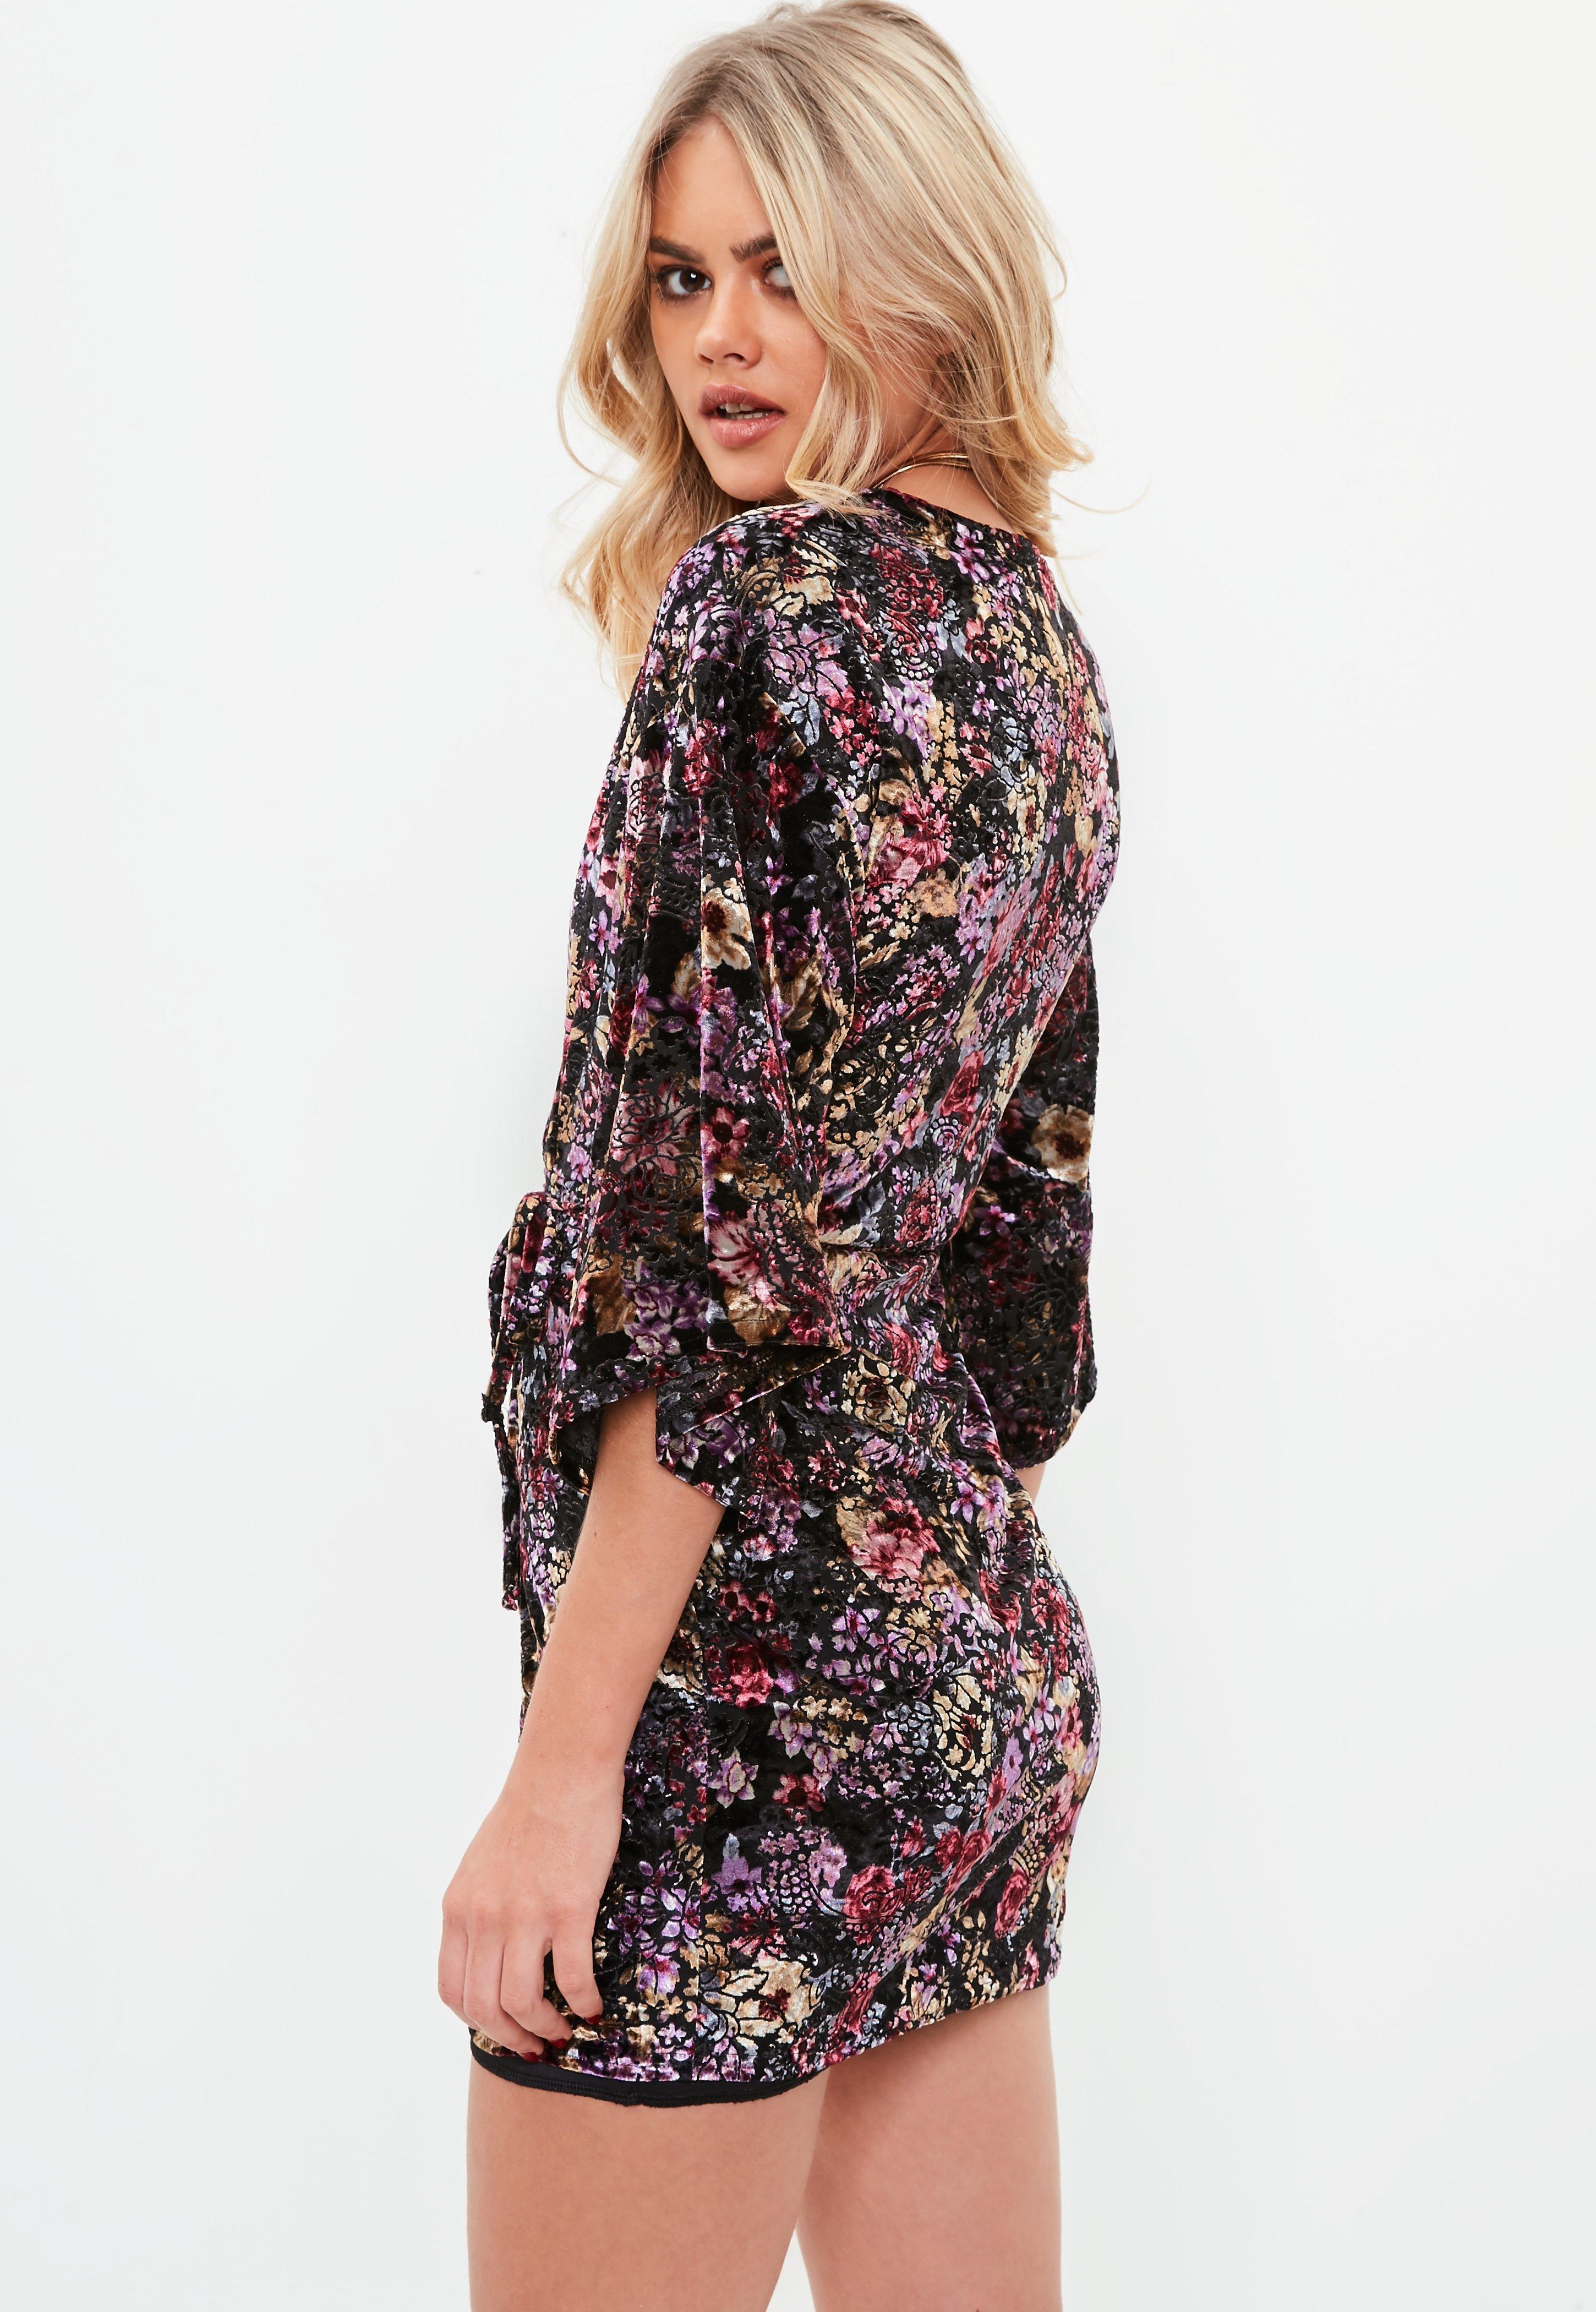 Missguided Velour Floral Print Mini Dress Order Cheap Sale Popular Sale High Quality Wear Resistance ggJXe